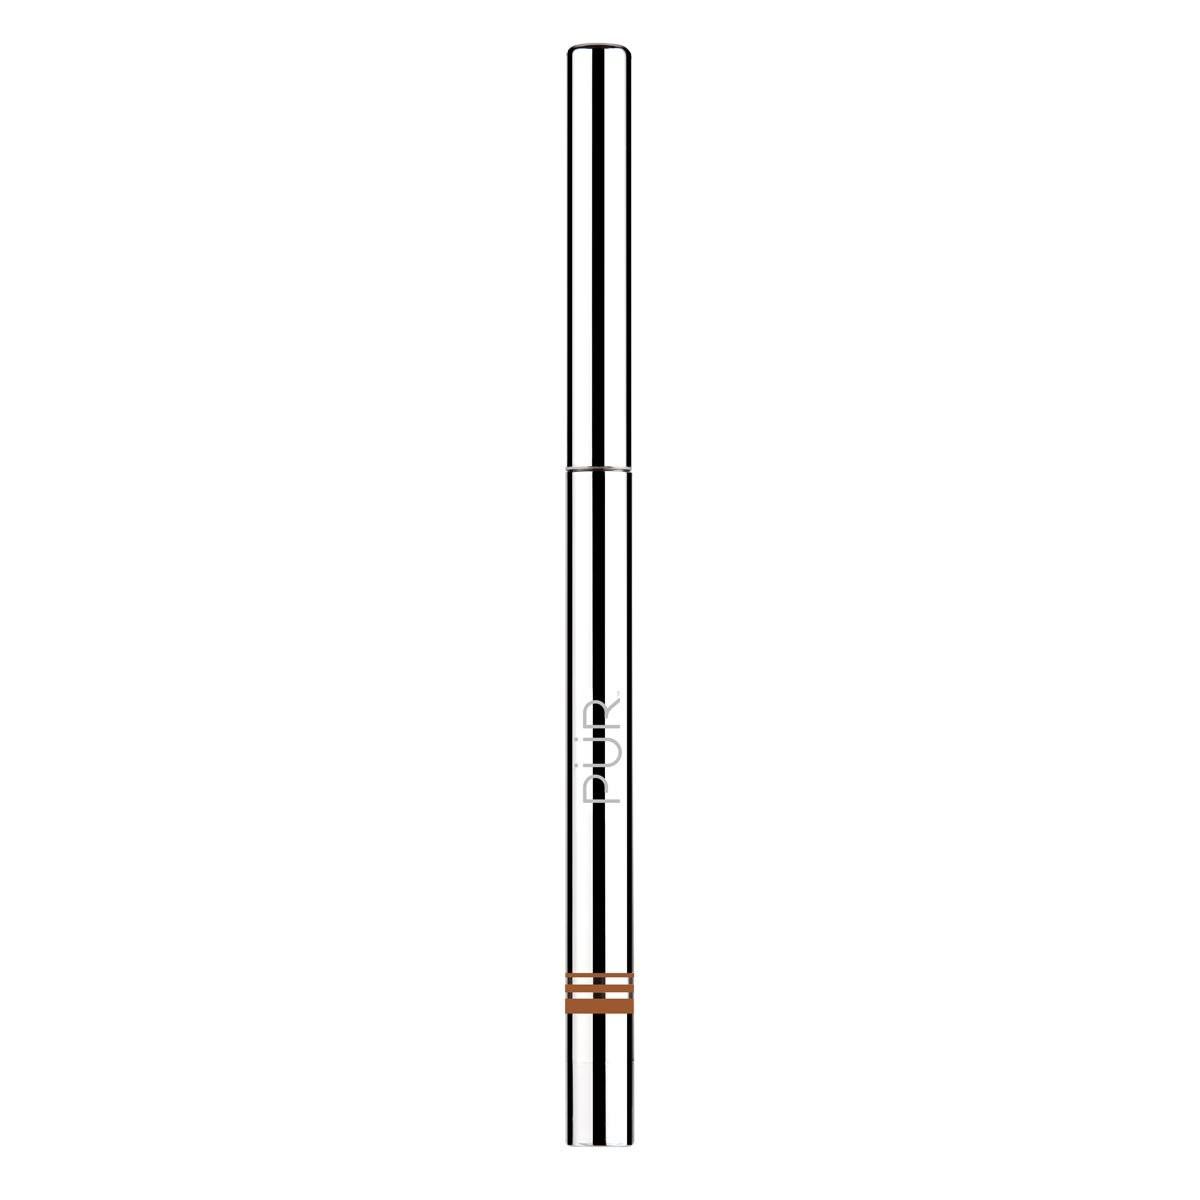 Quick Draw Concealer Pencil in Dark